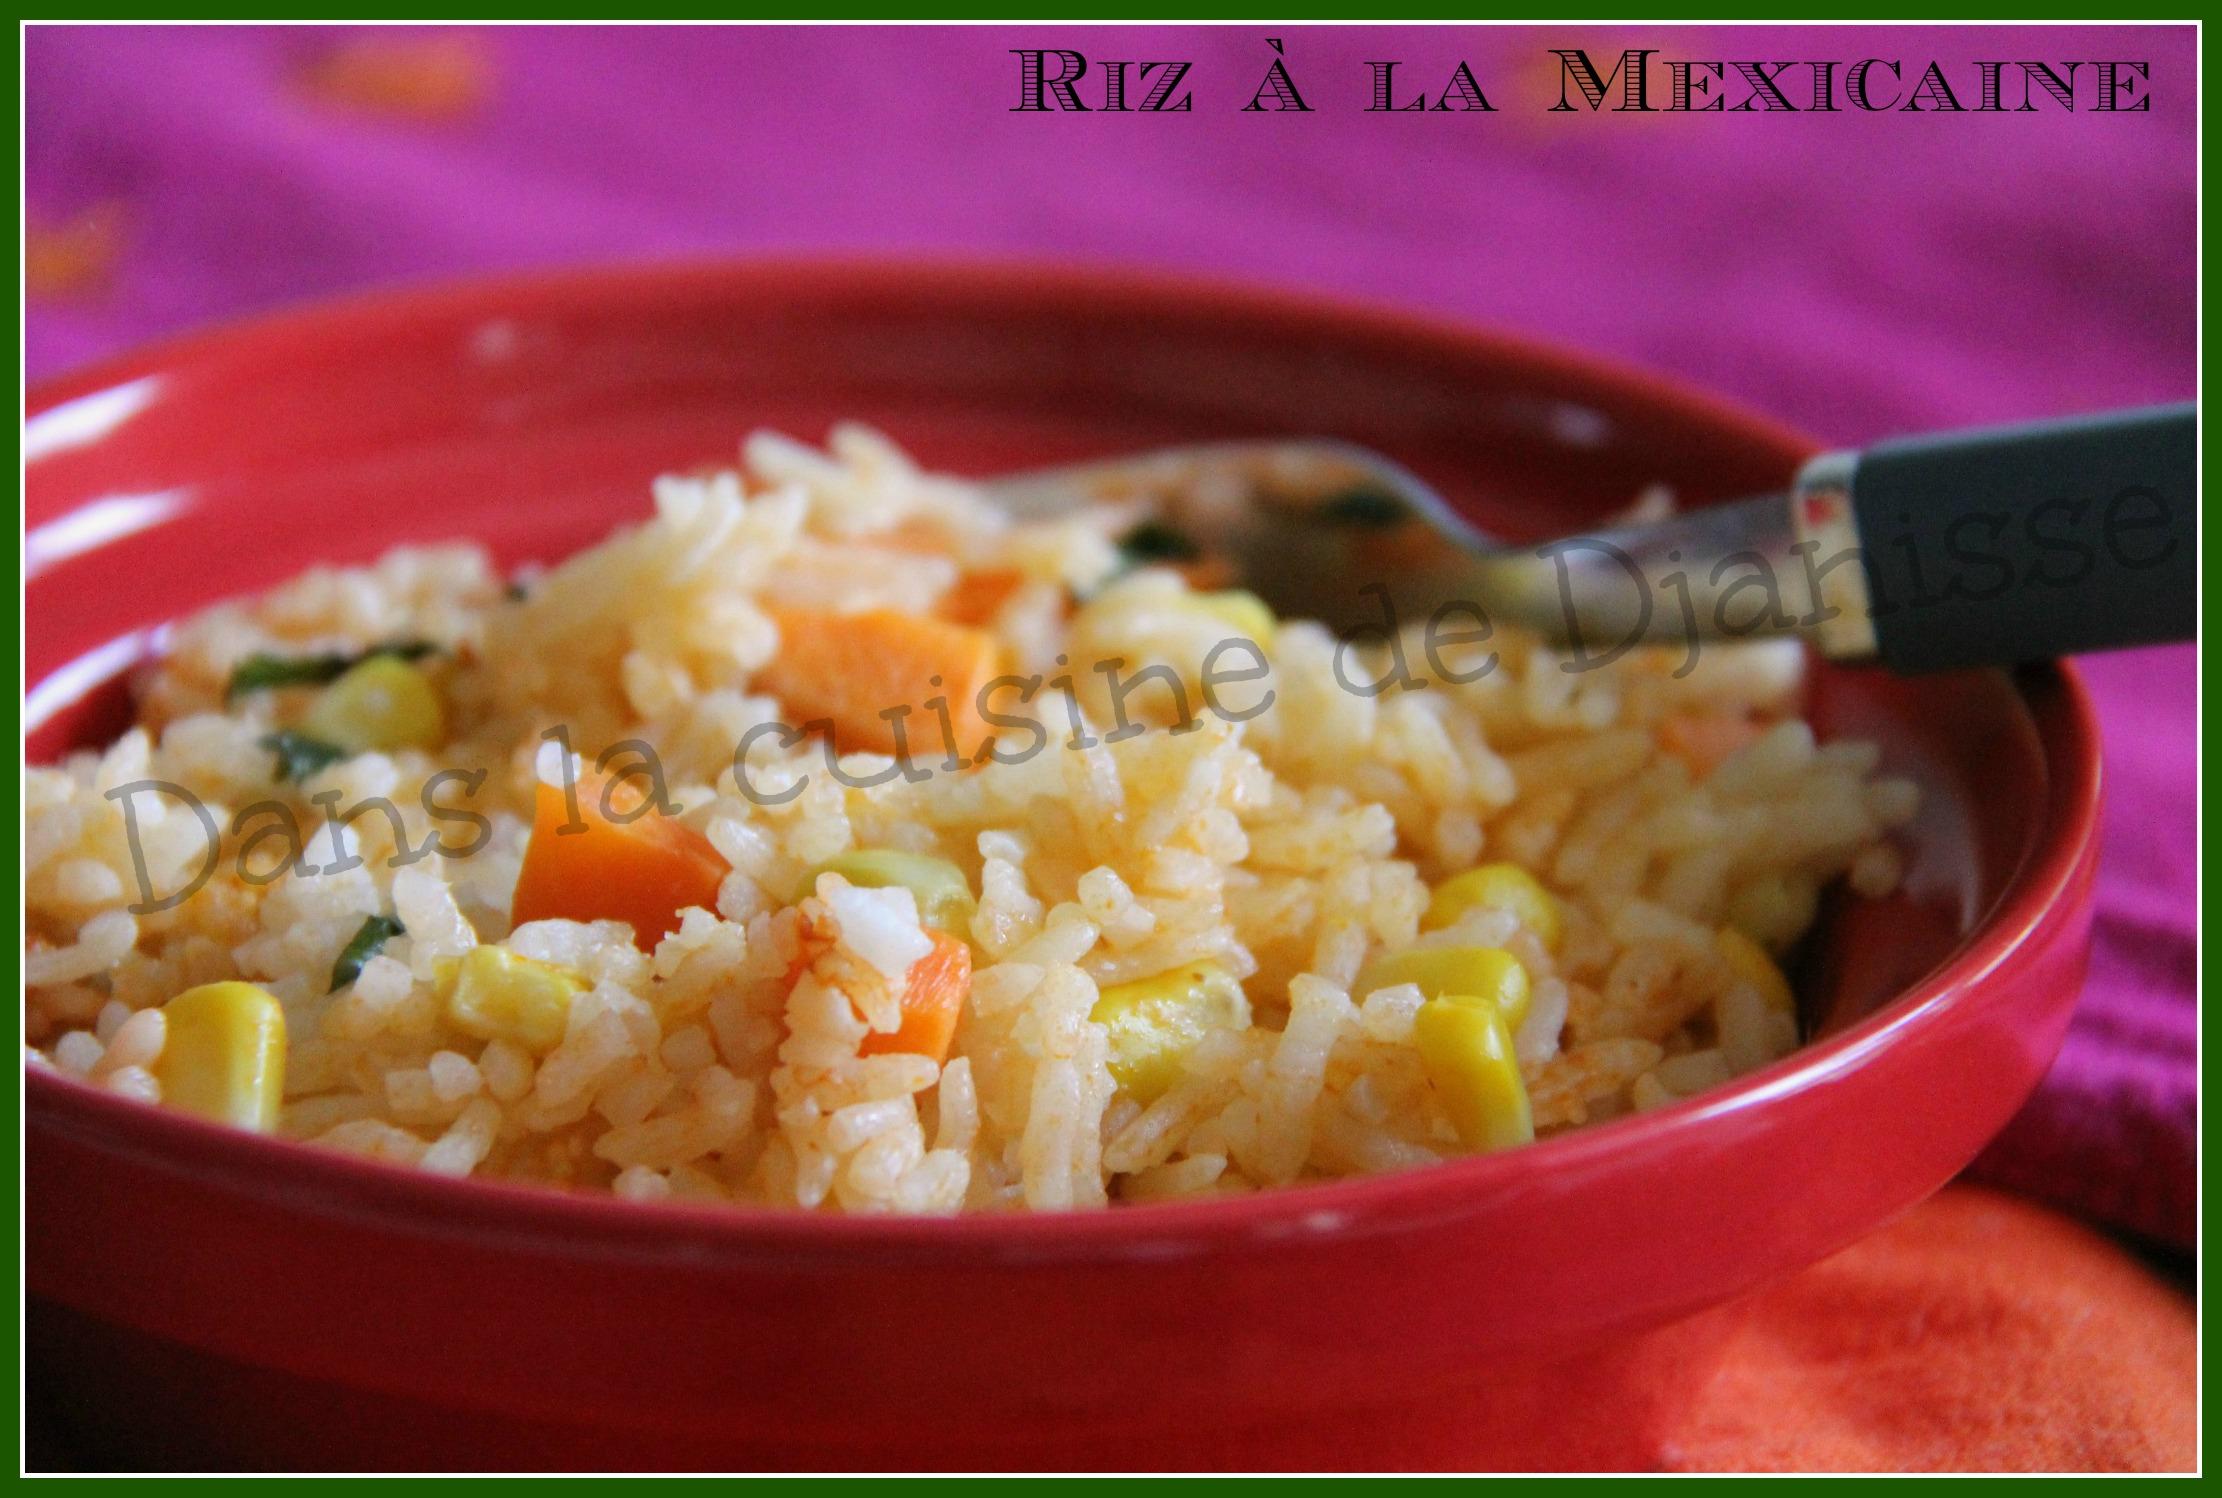 Rix mexicain